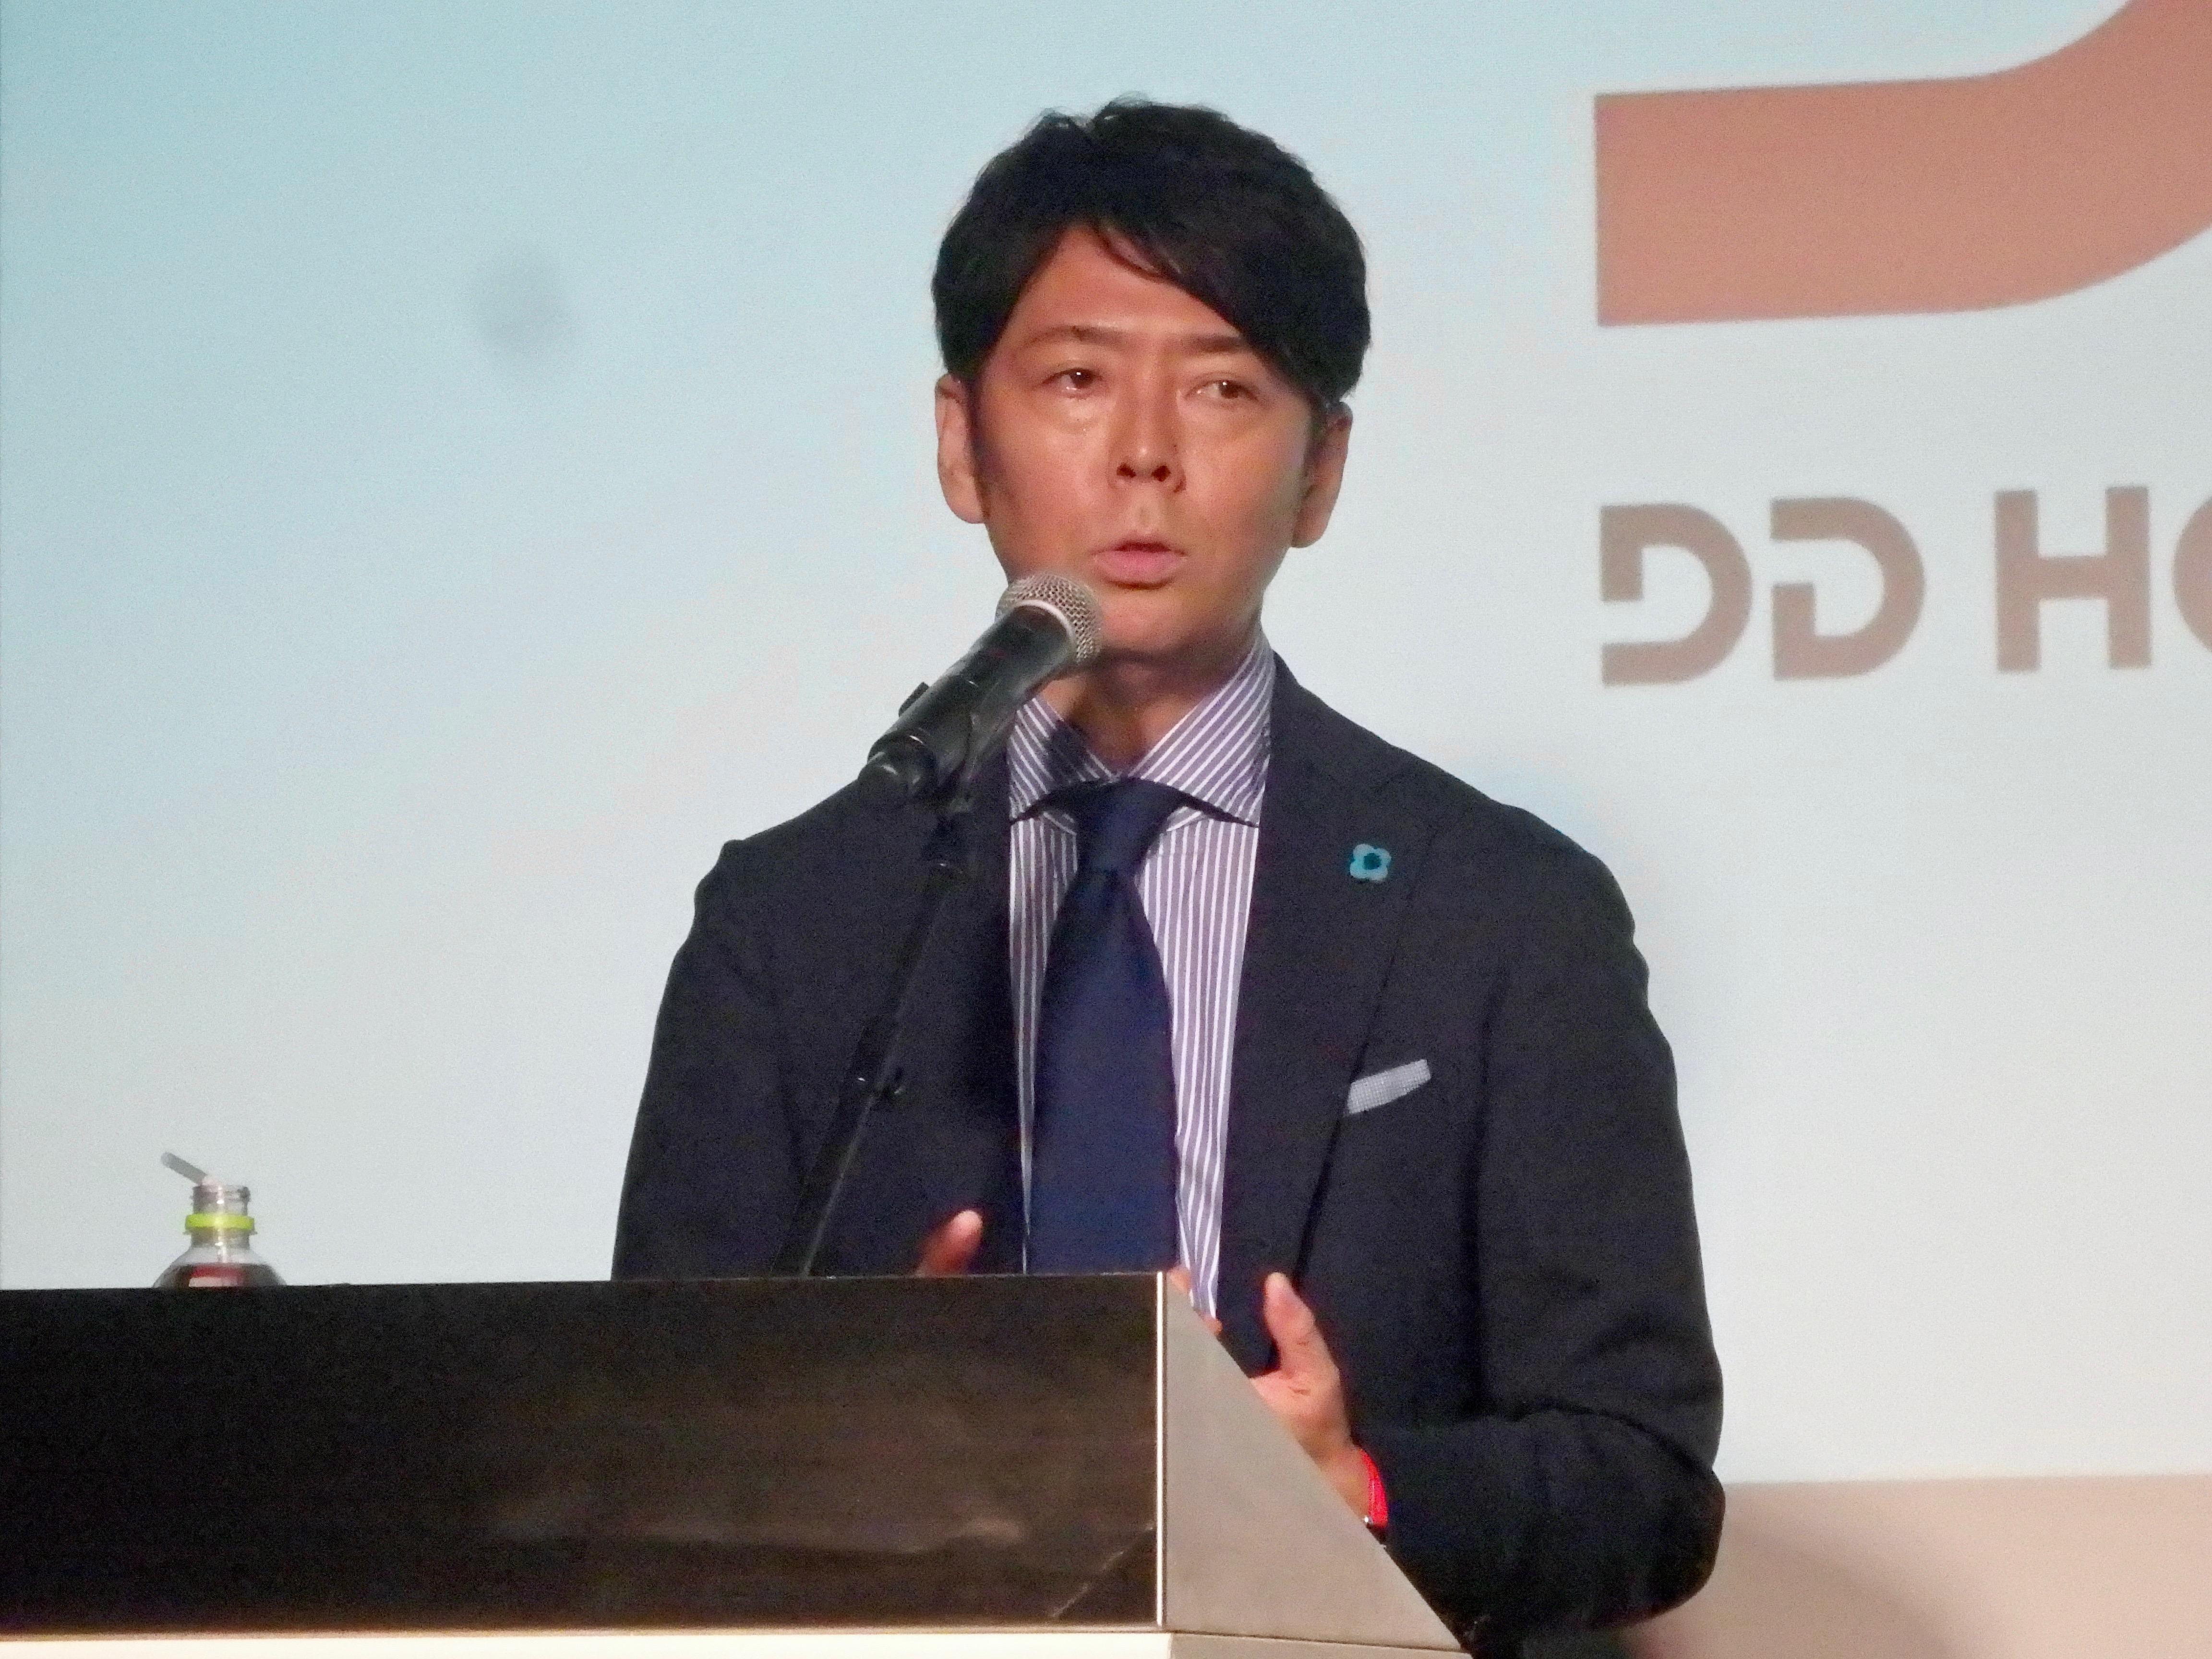 http://news.yoshimoto.co.jp/20170831234904-e300de861f5f8b518dbedc766df33fef1b94d24c.jpg